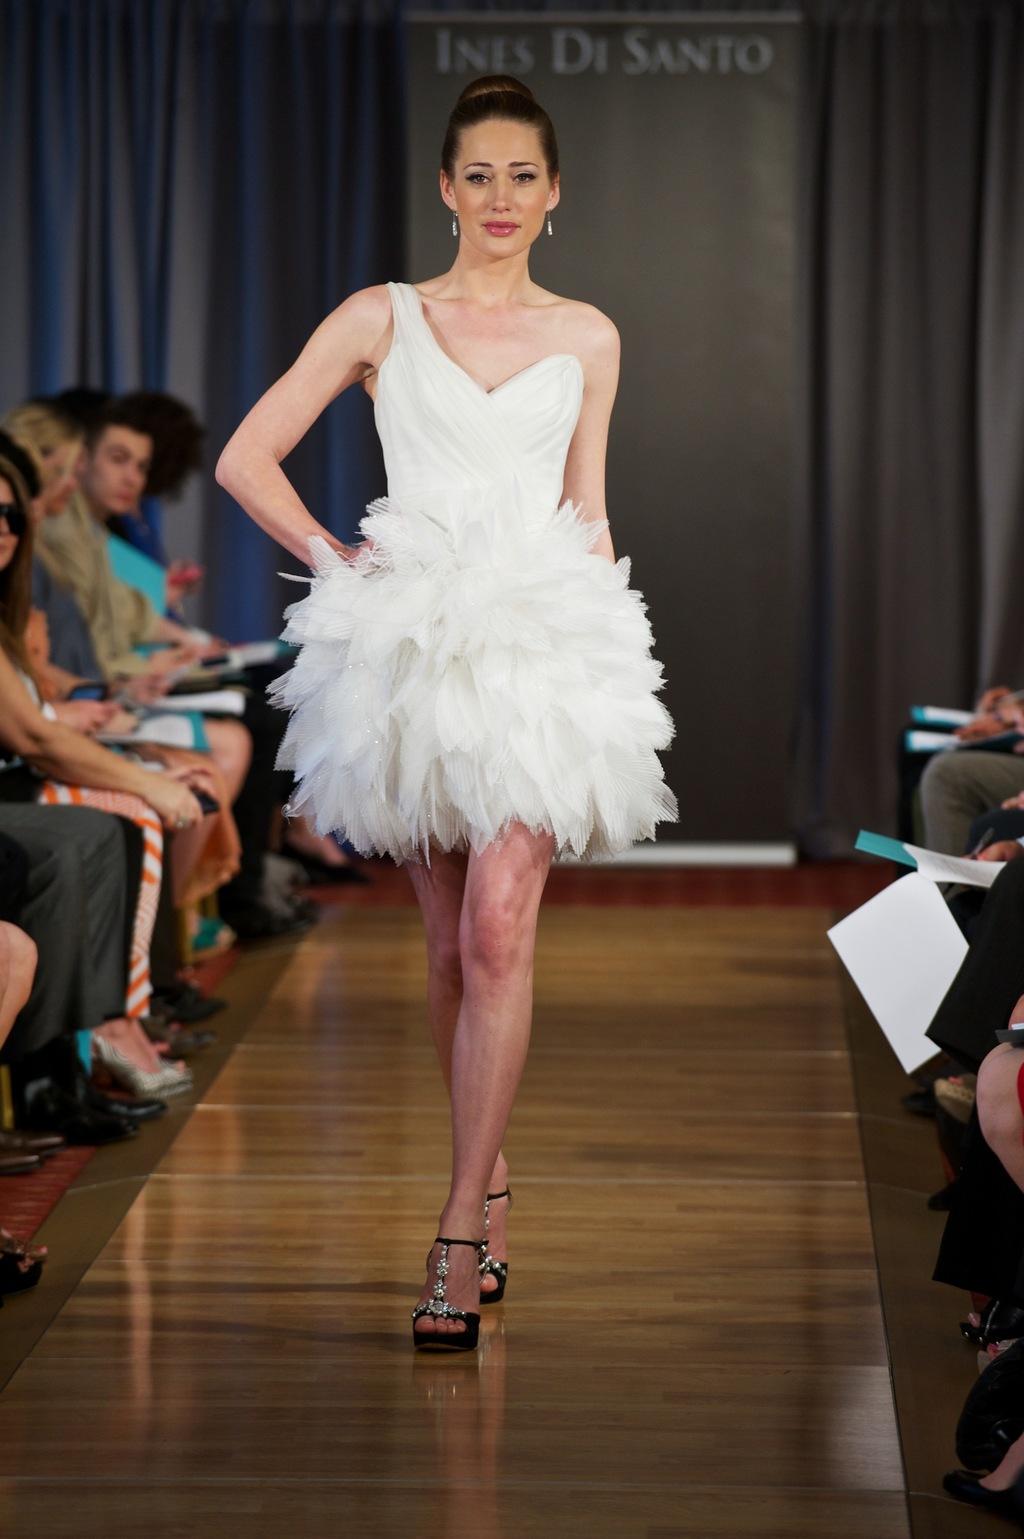 Wedding-dress-spring-2013-bridal-gowns-ines-di-santo-22.full